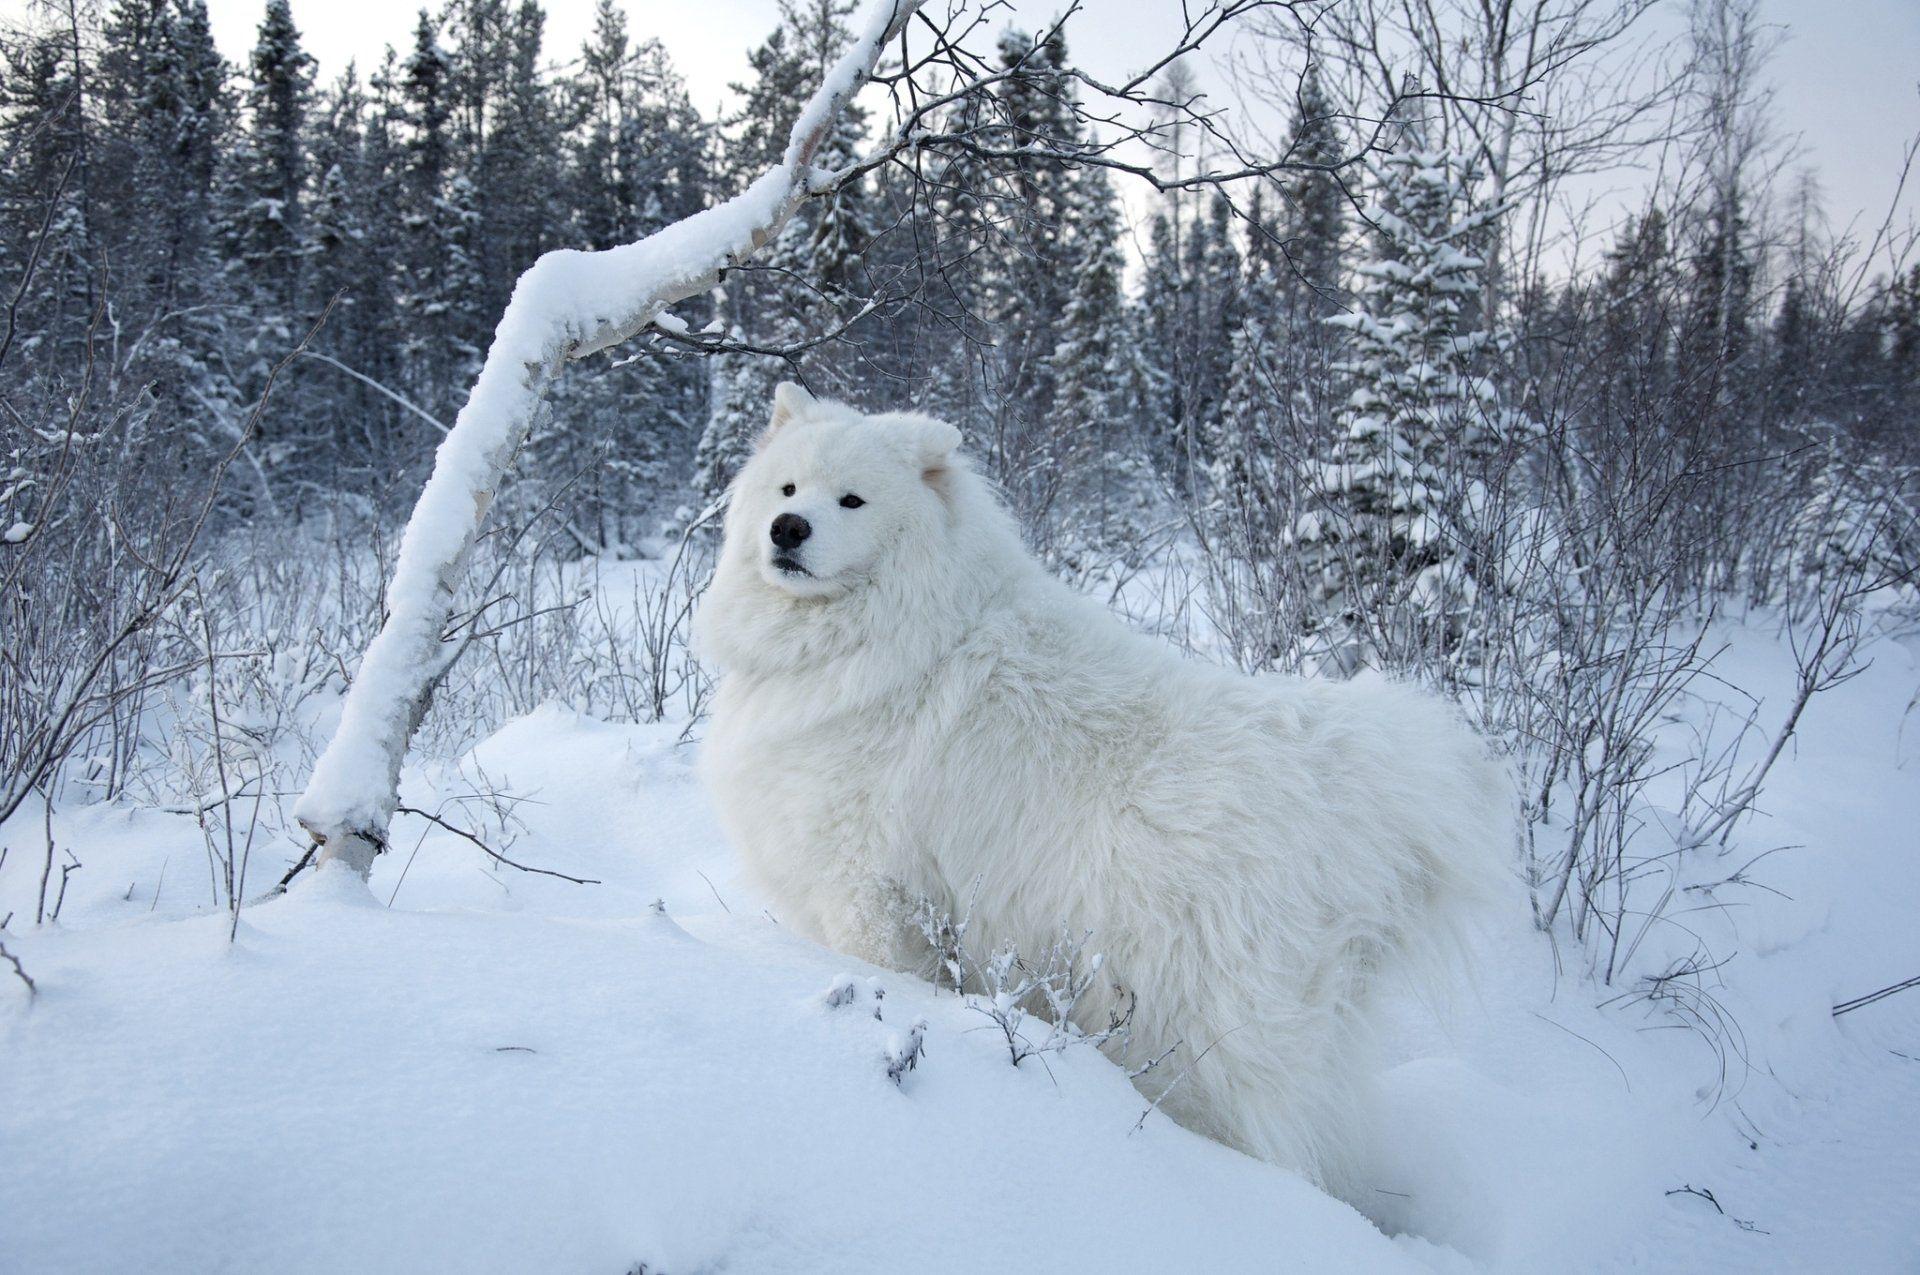 Animal Samoyed Snow Winter Pet Dog Wallpaper Samoyed Dogs